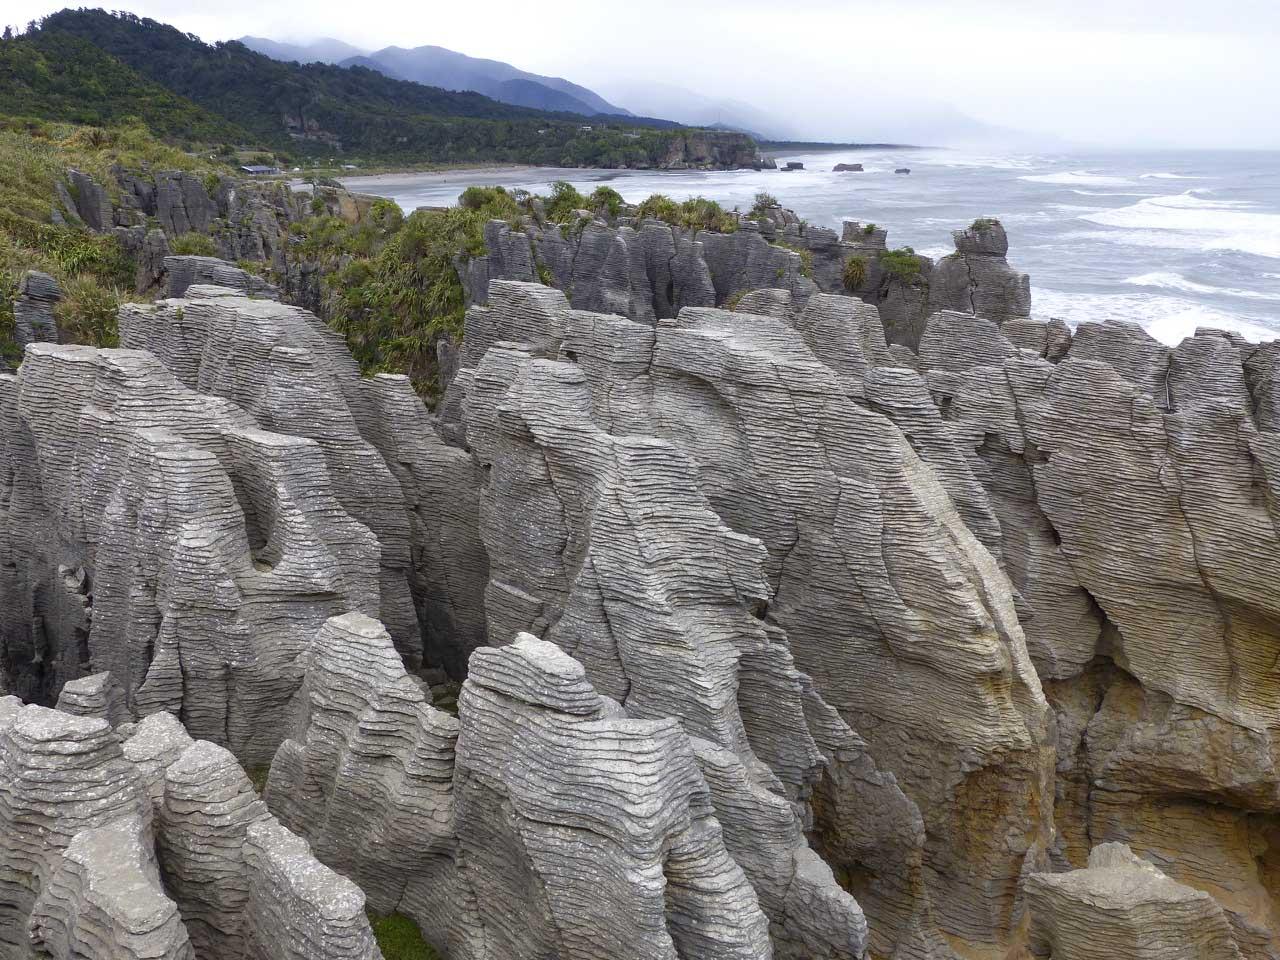 The 'pancake' rocks at Punakaiki, South Island, New Zealand